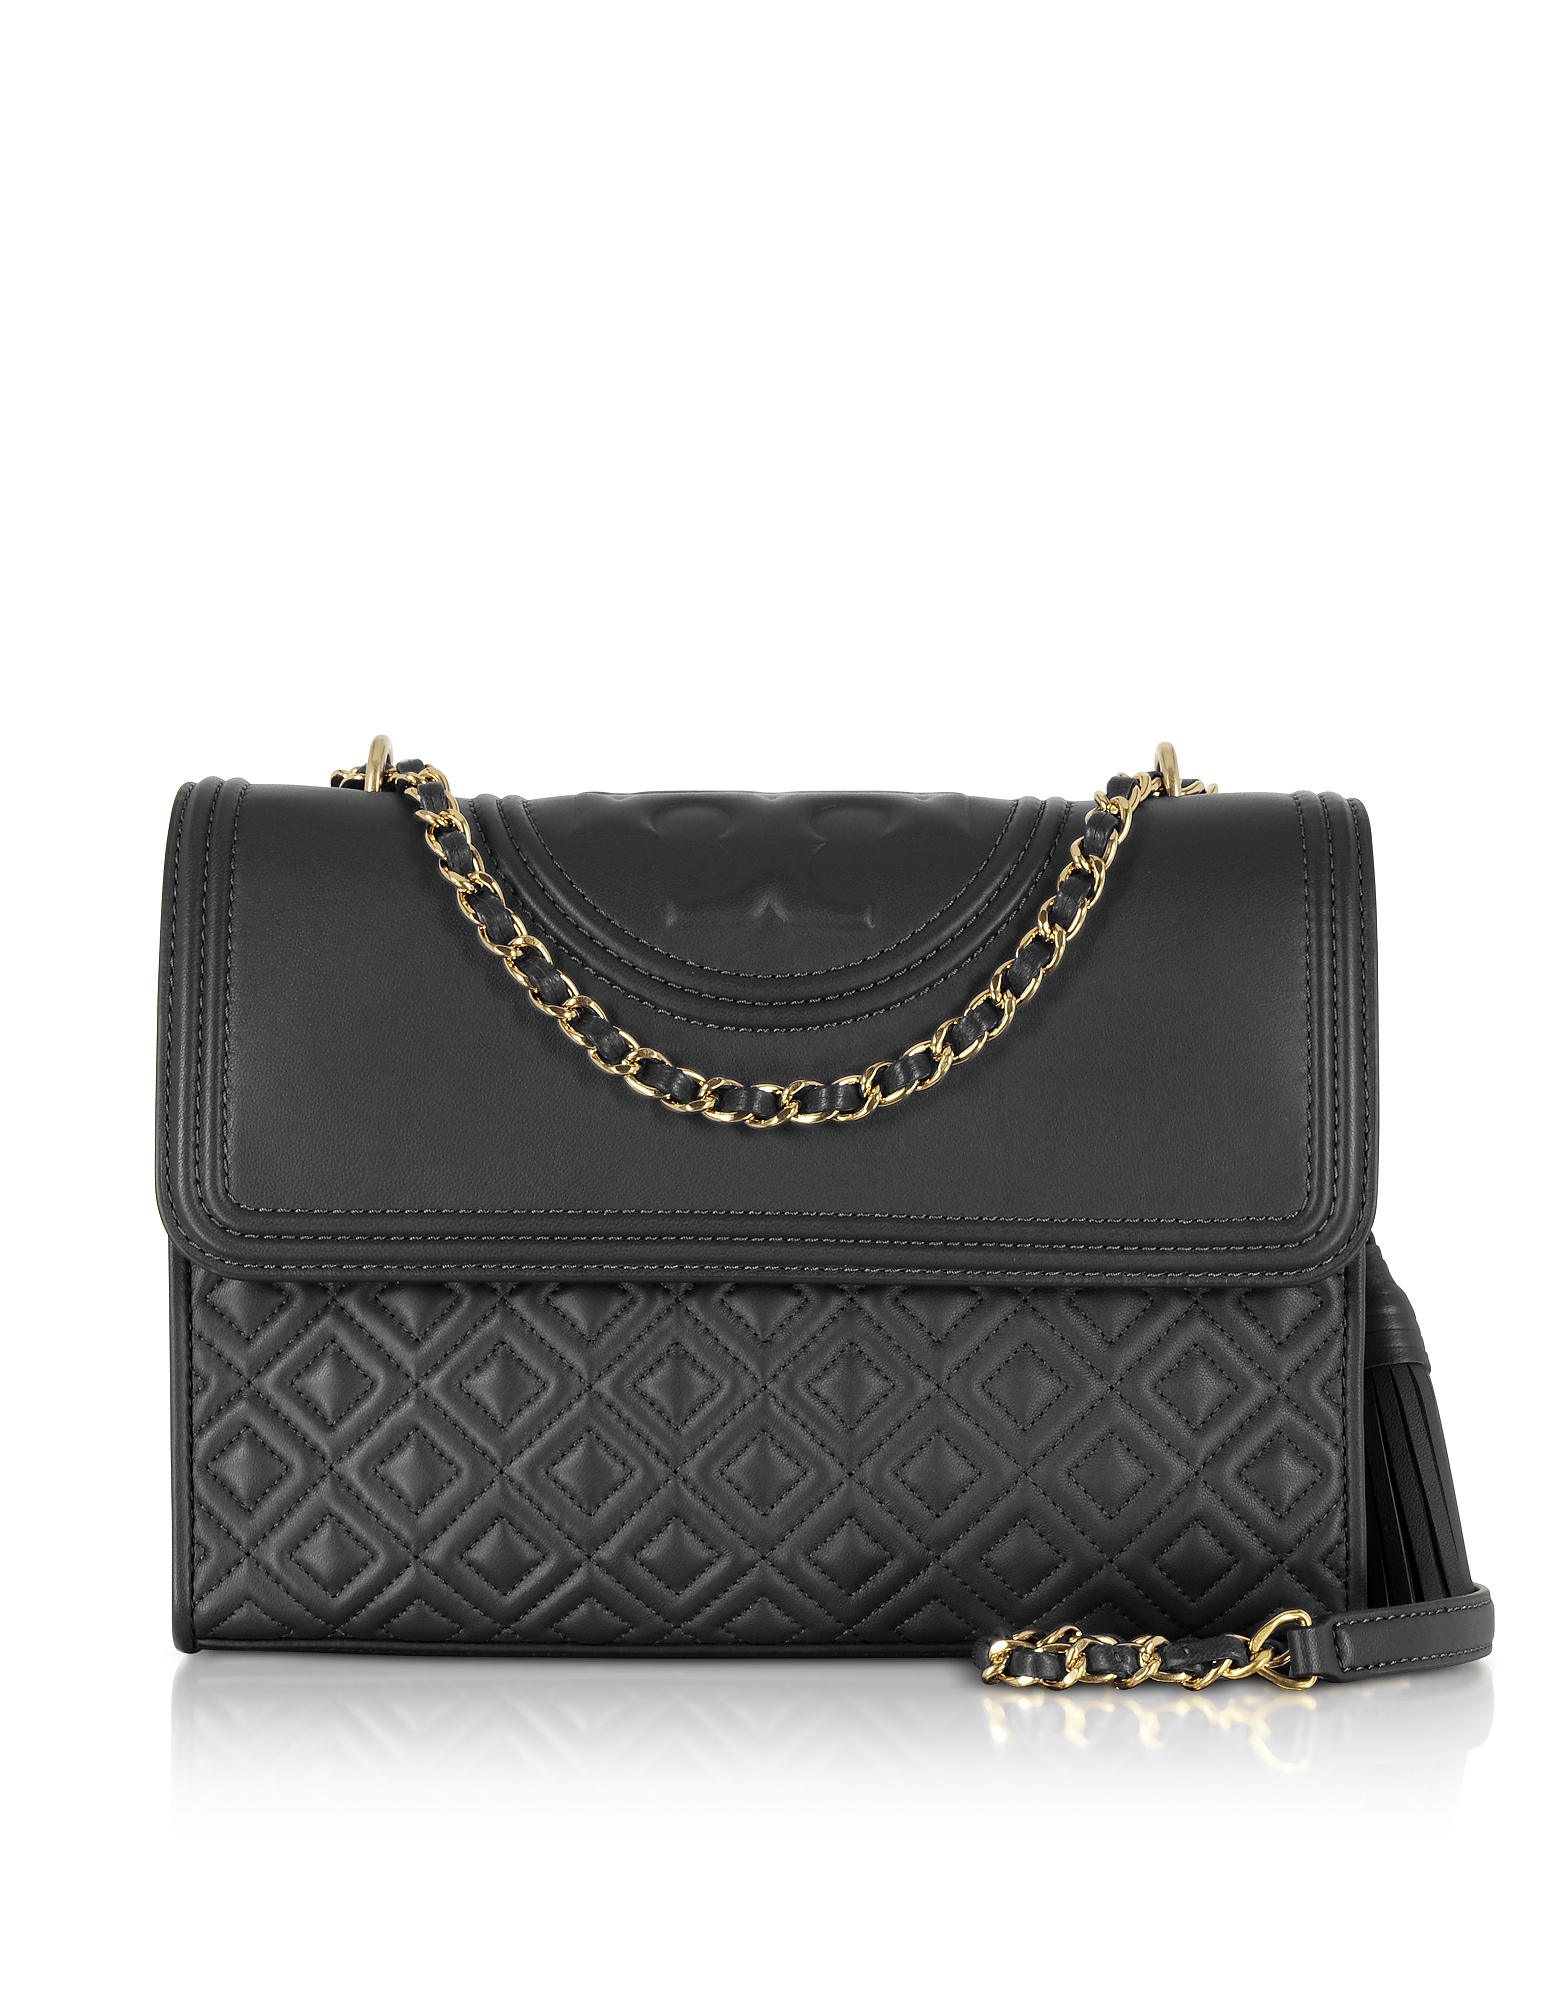 Tory Burch Handbags, Fleming Black Leather Convertible Shoulder Bag